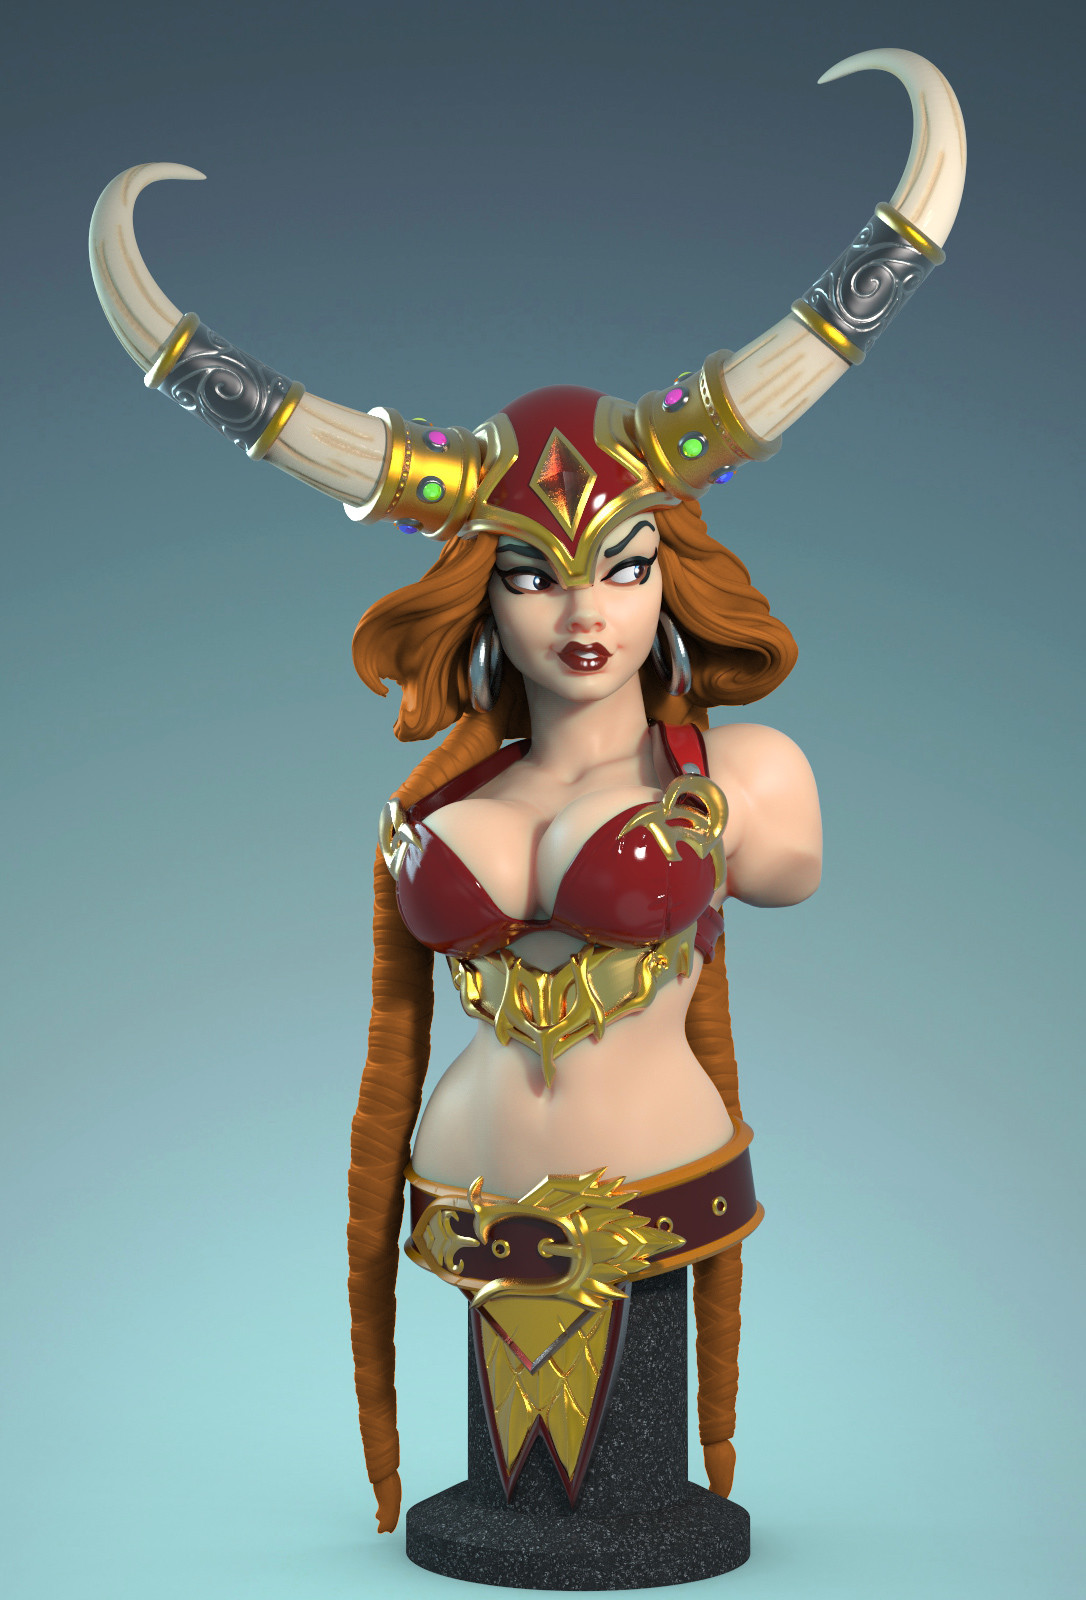 Freya 3d print bust